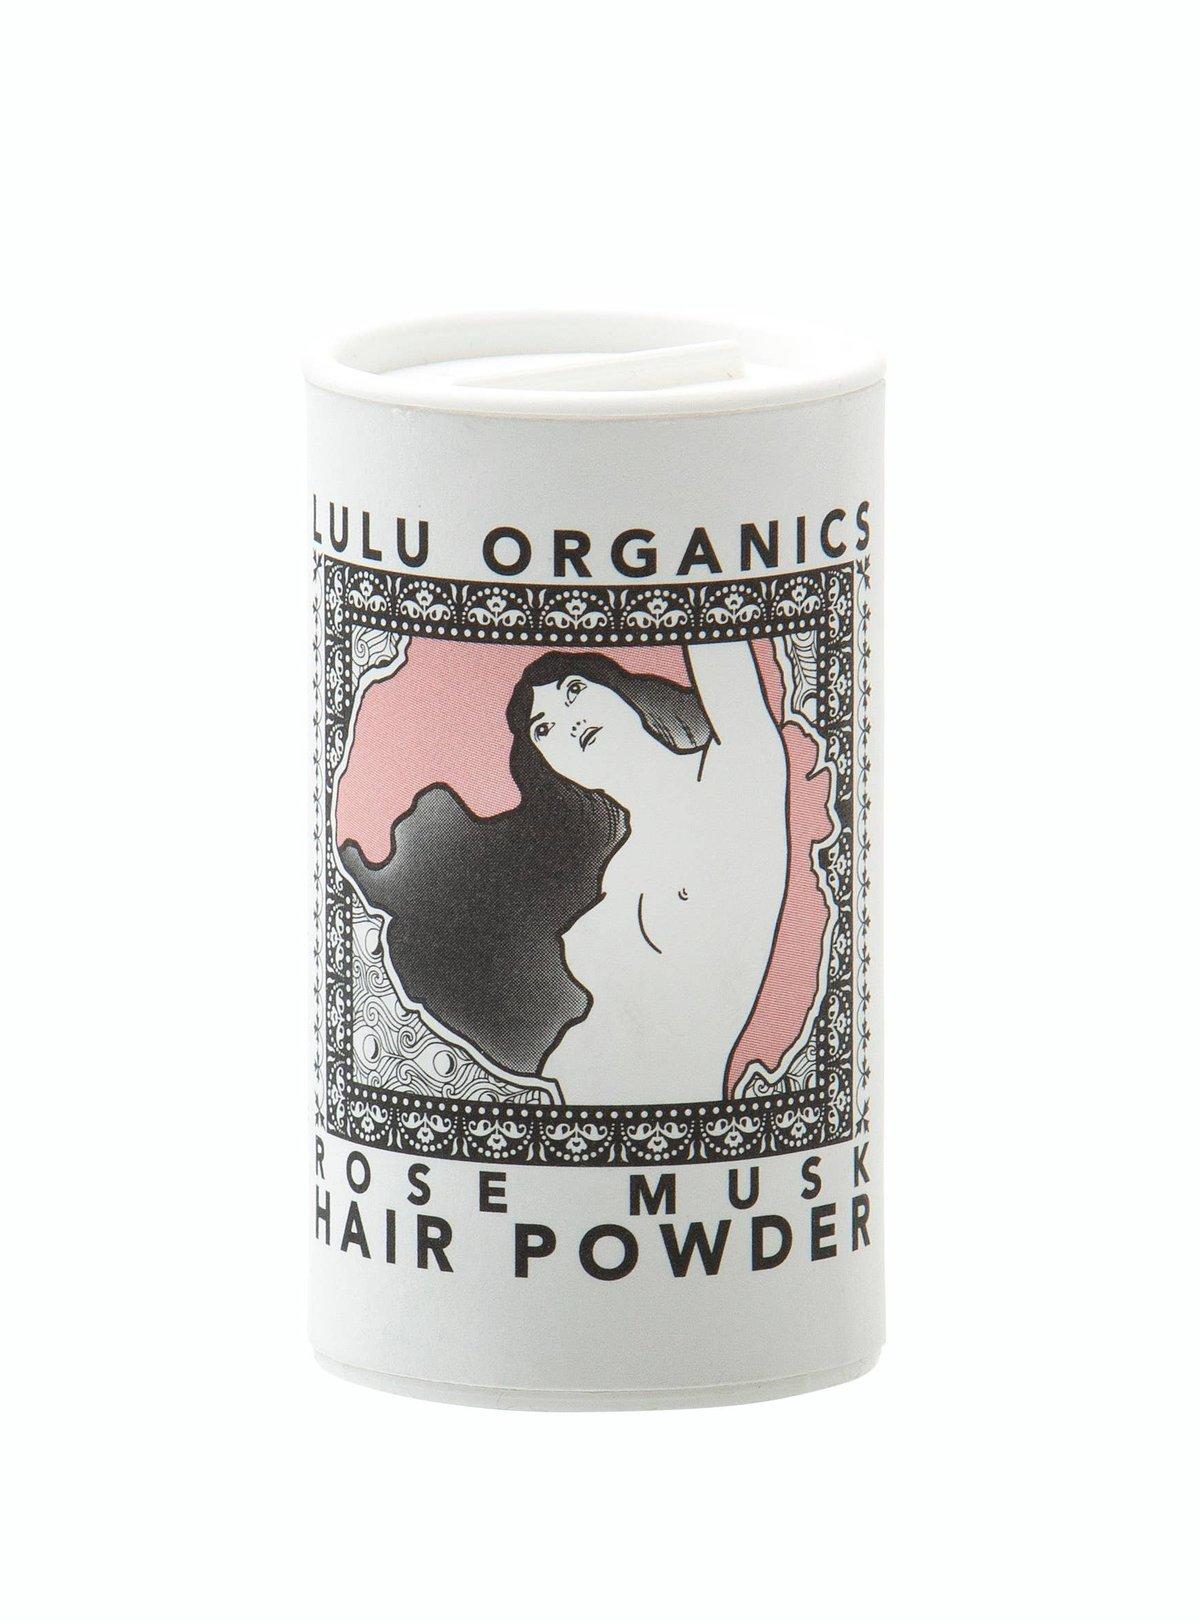 Image of Lulu Organics Dry Shampoo - Rose Musk